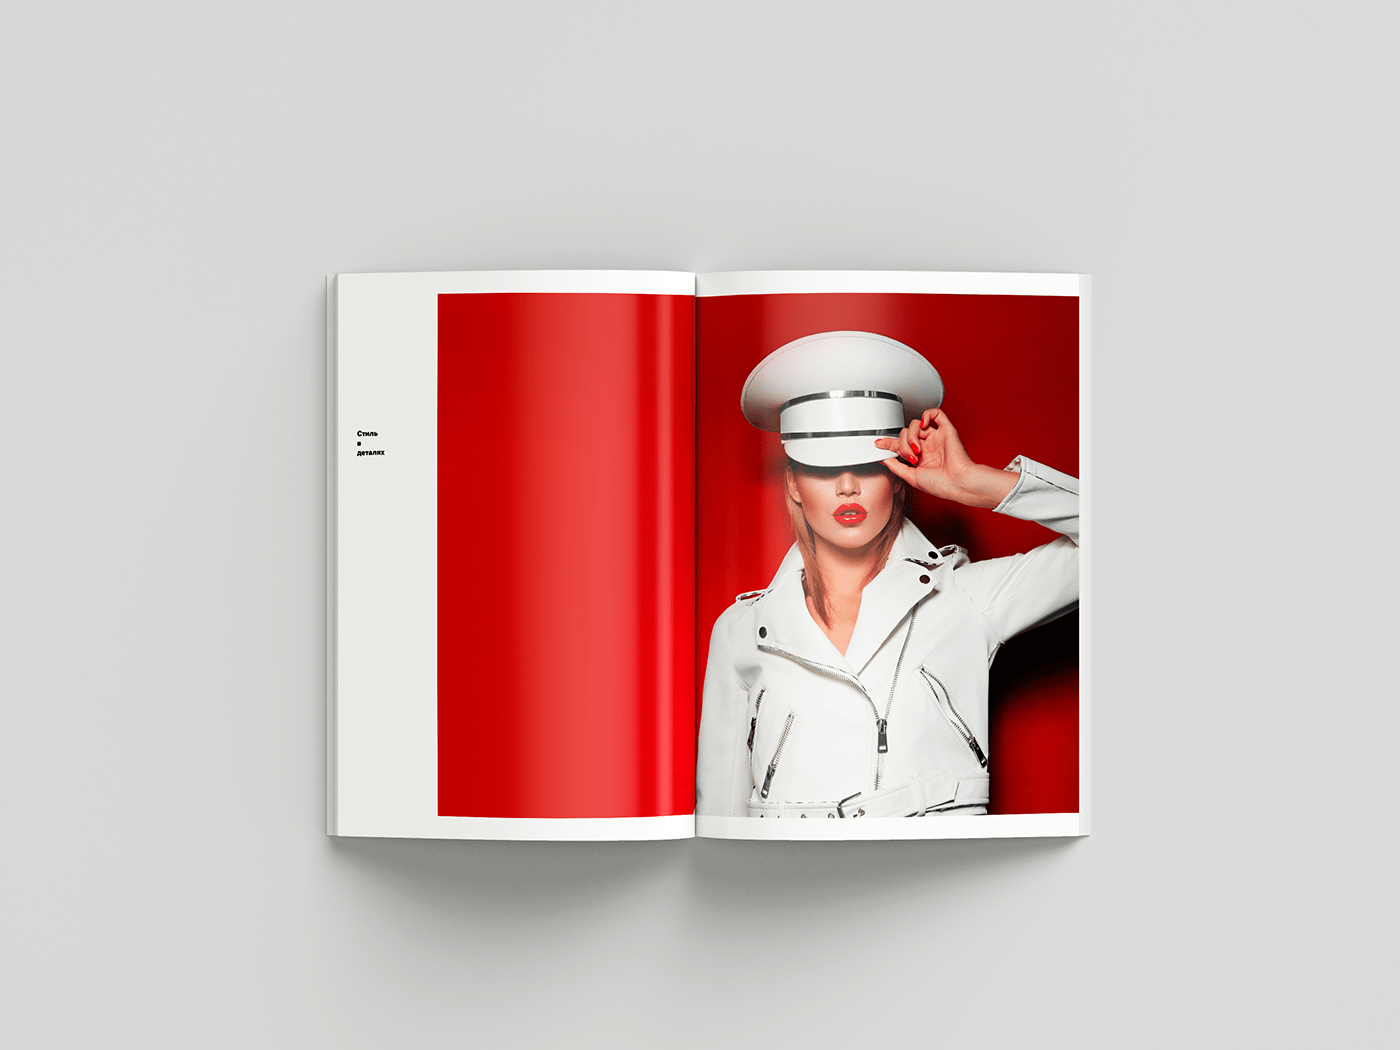 книга журнал газета портрет верстка реклама book Advertising  magazin newspaper